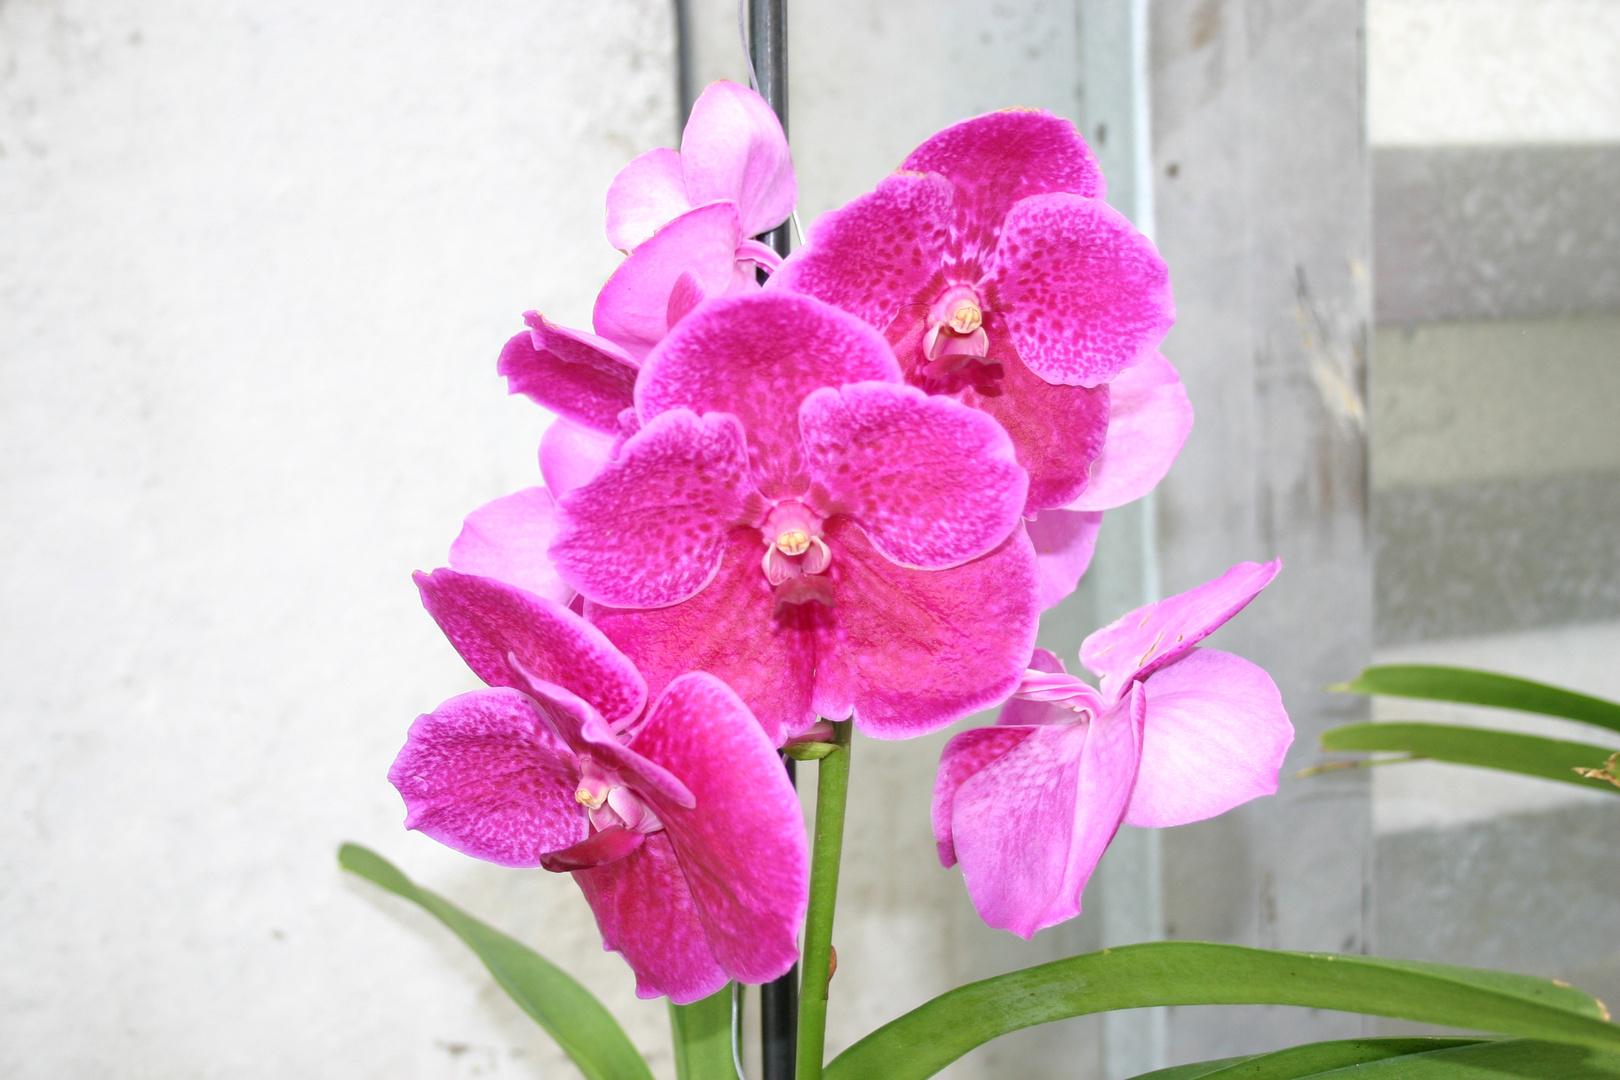 Rosa Traum (Orchidee)